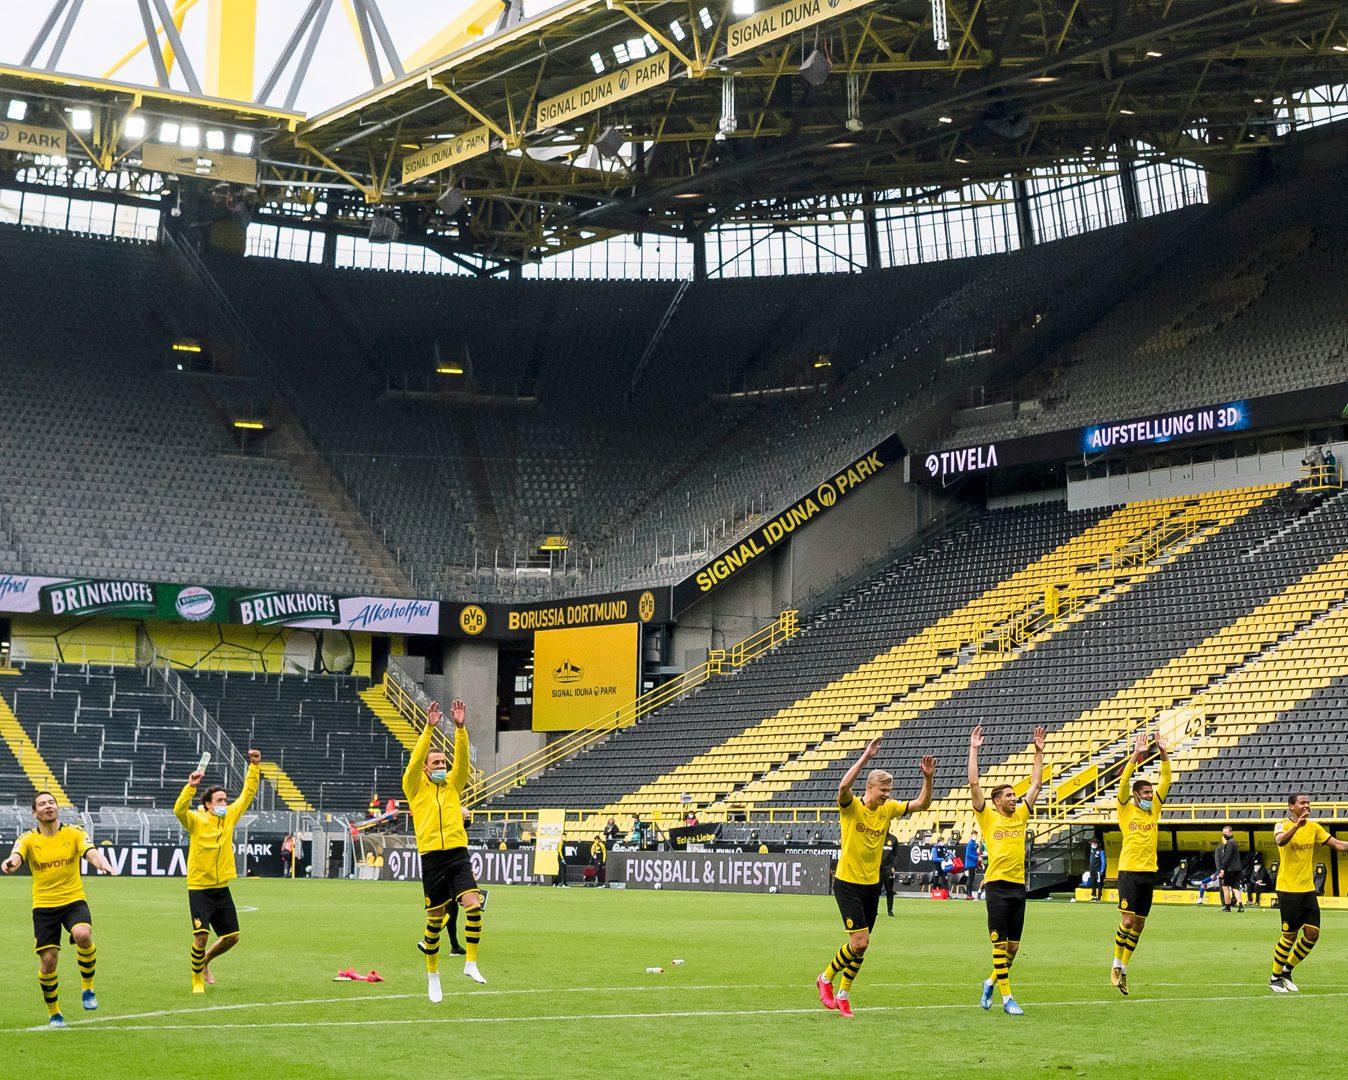 Bundesliga Borussia Dortmund Celebrate With Absent Fans After Dominant Schalke Win